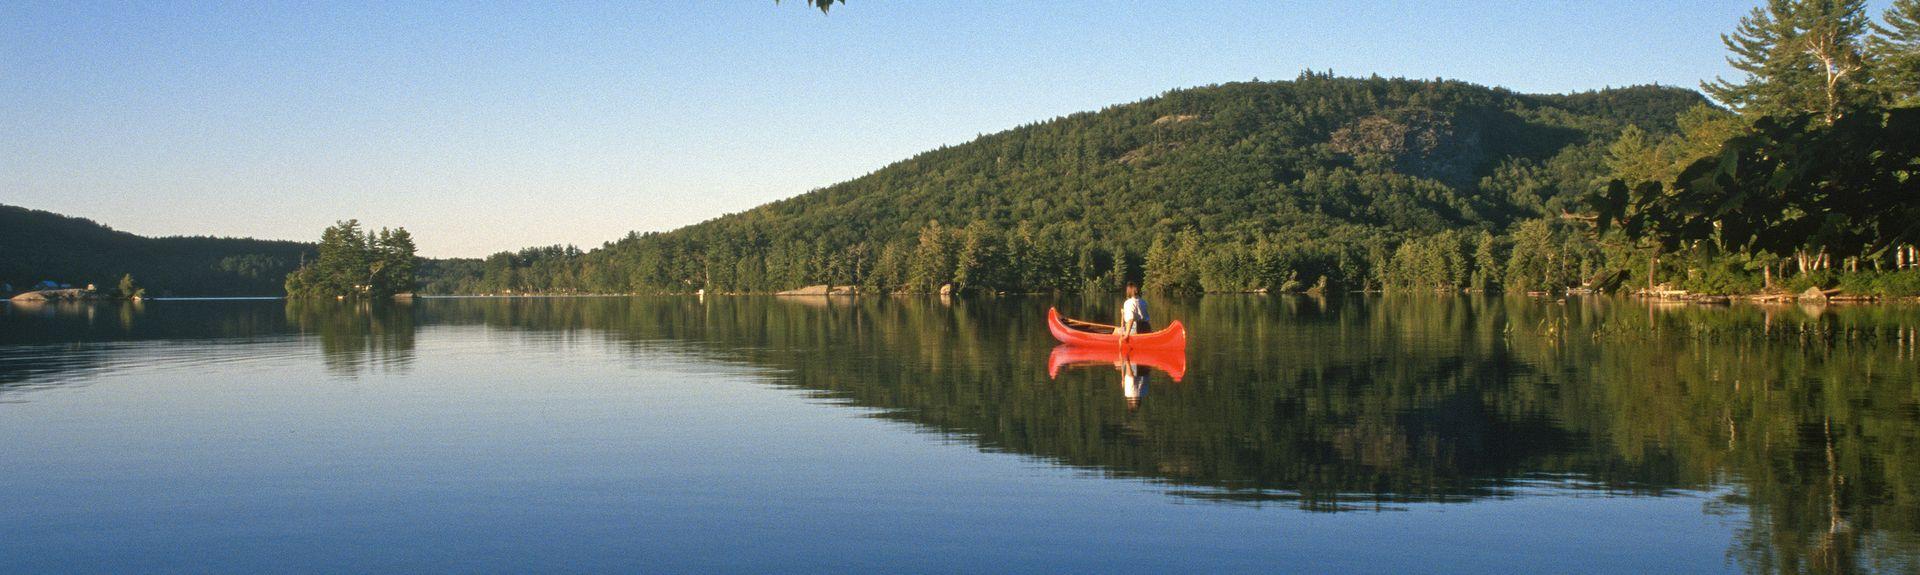 Woodstock, Bryant Pond, Maine, United States of America